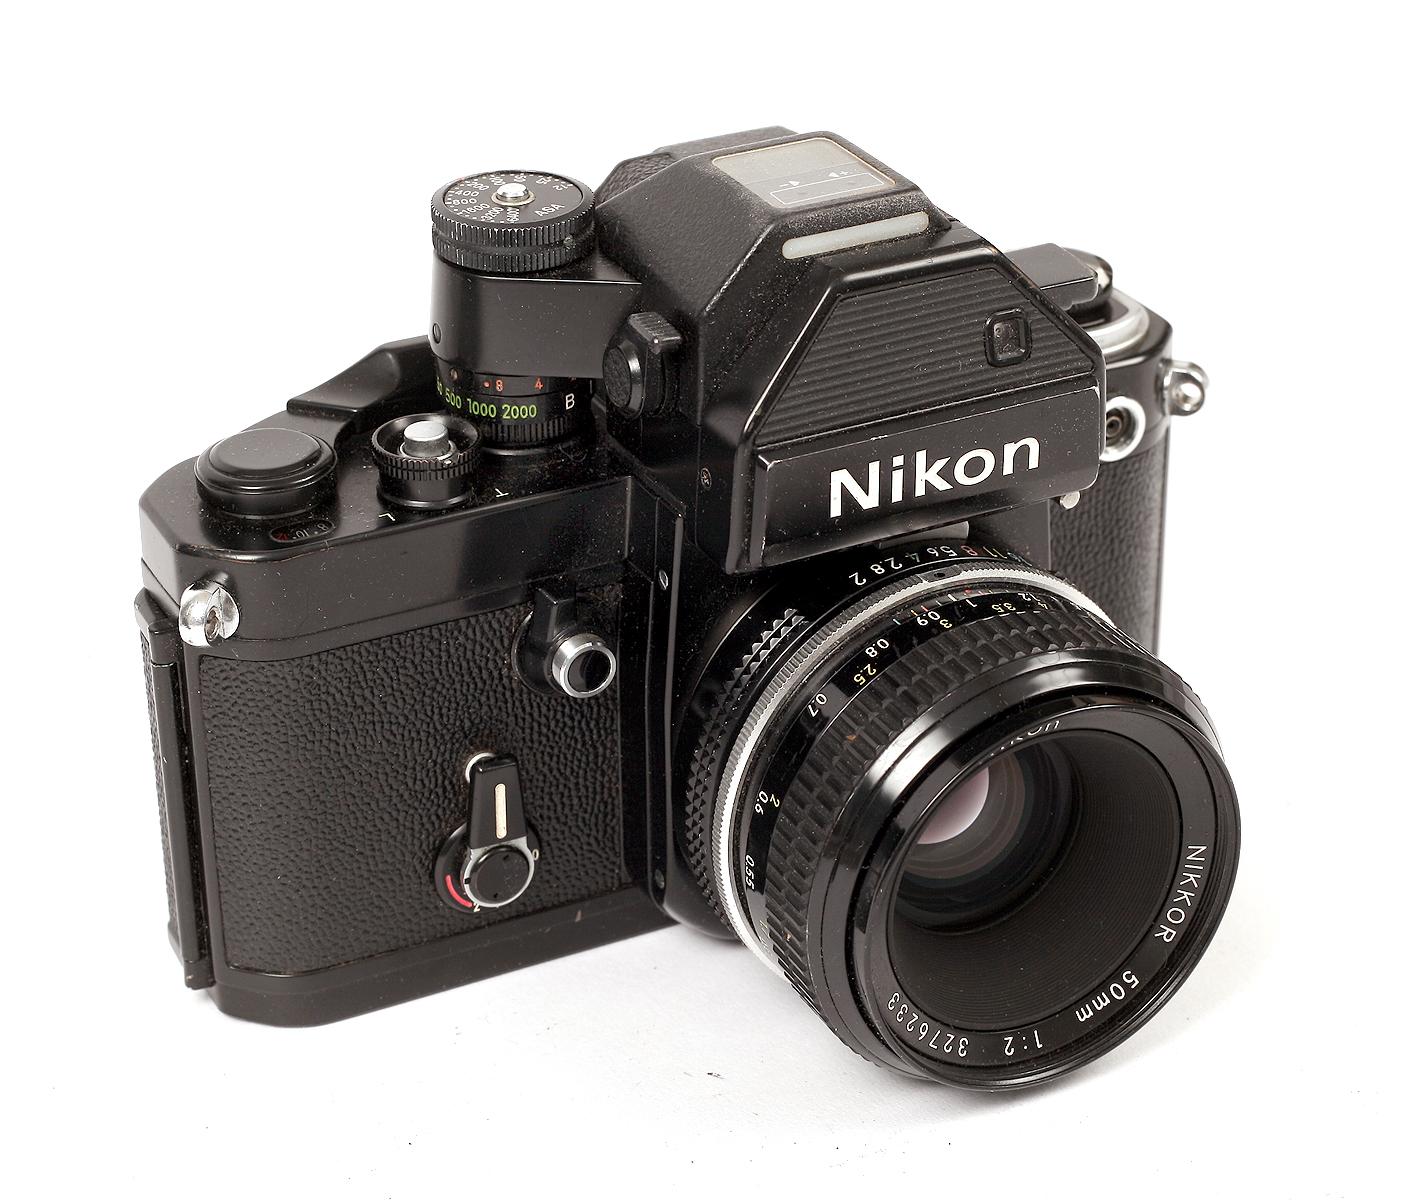 Lot 39 - Black Nikon F2S Photomic with Nikon 50mm f2 Pre-Ai Lens. #F2 body #7157083, lens #3276233. (